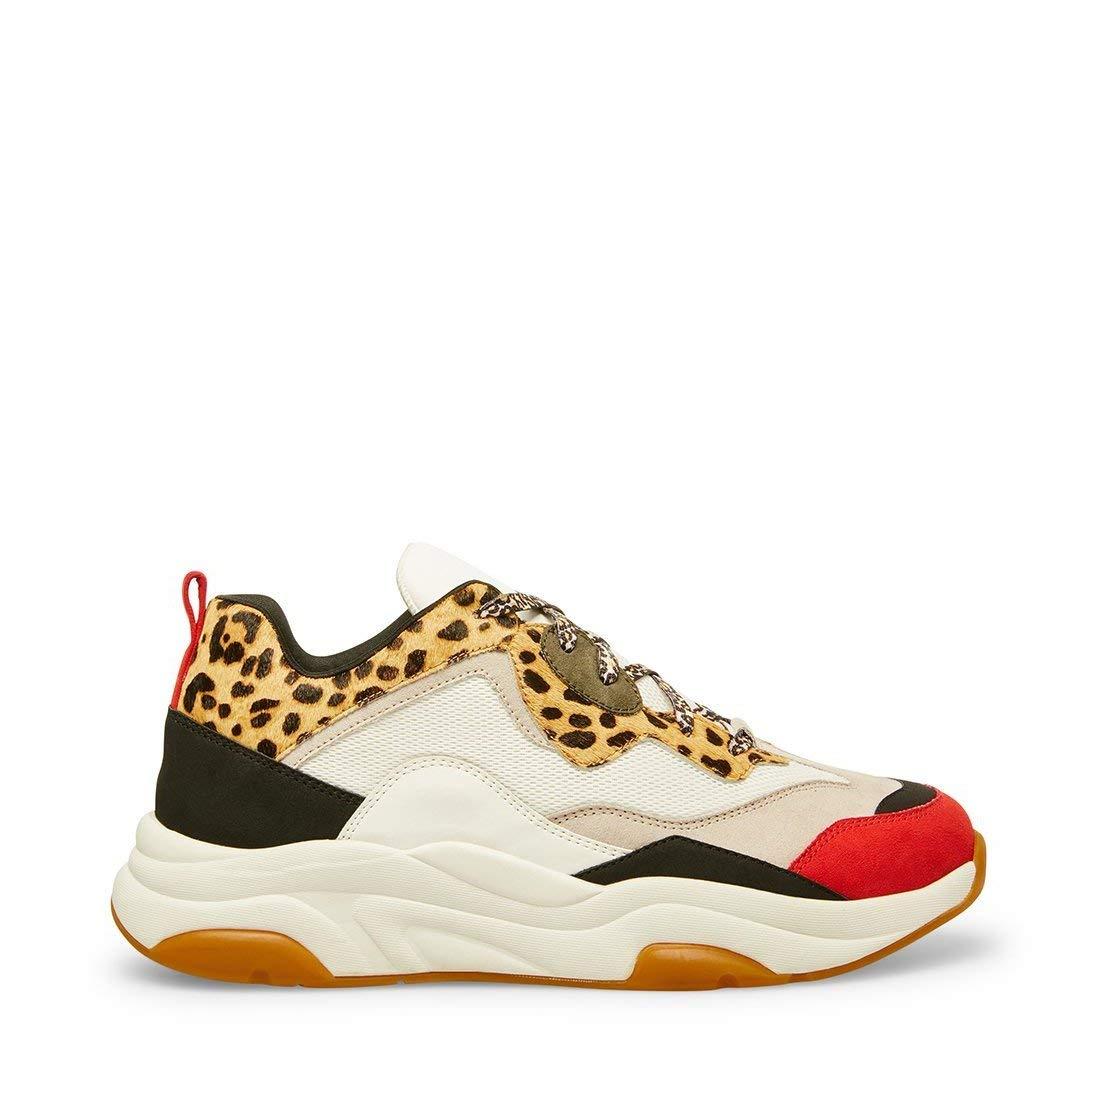 Steve Madden Antonio Sneaker Leopard